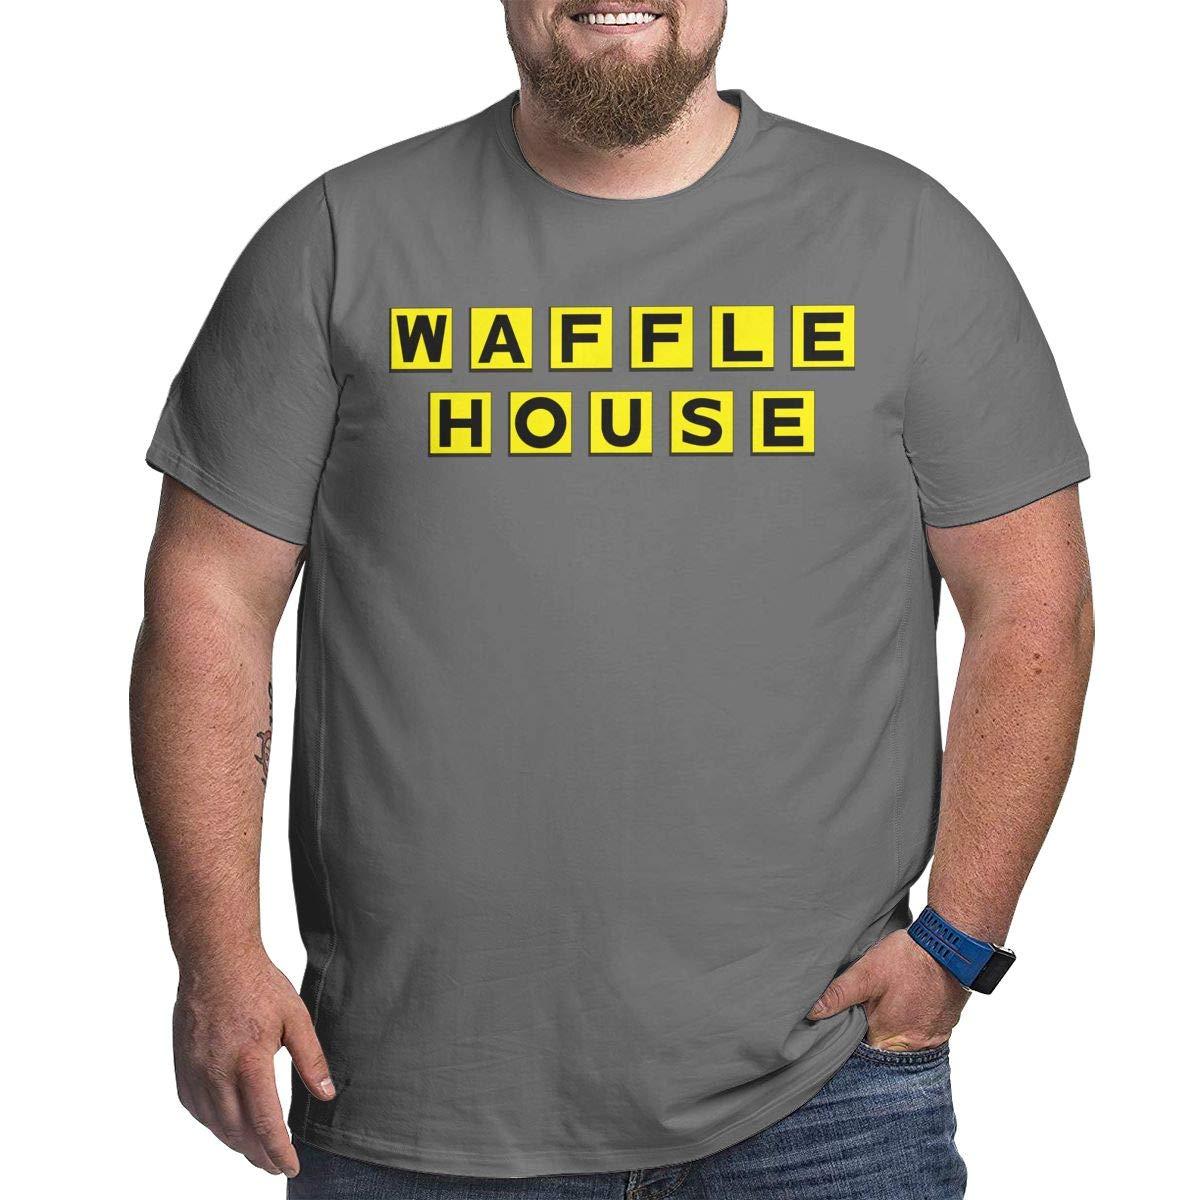 Fat Men's T Shirt Waffle House Logo Tee Shirts Cotton T-Shirt Short-Sleeve Round Neck Tshirt for Men Youth Boys Plus Size 4XL Deep Heather by BKashy